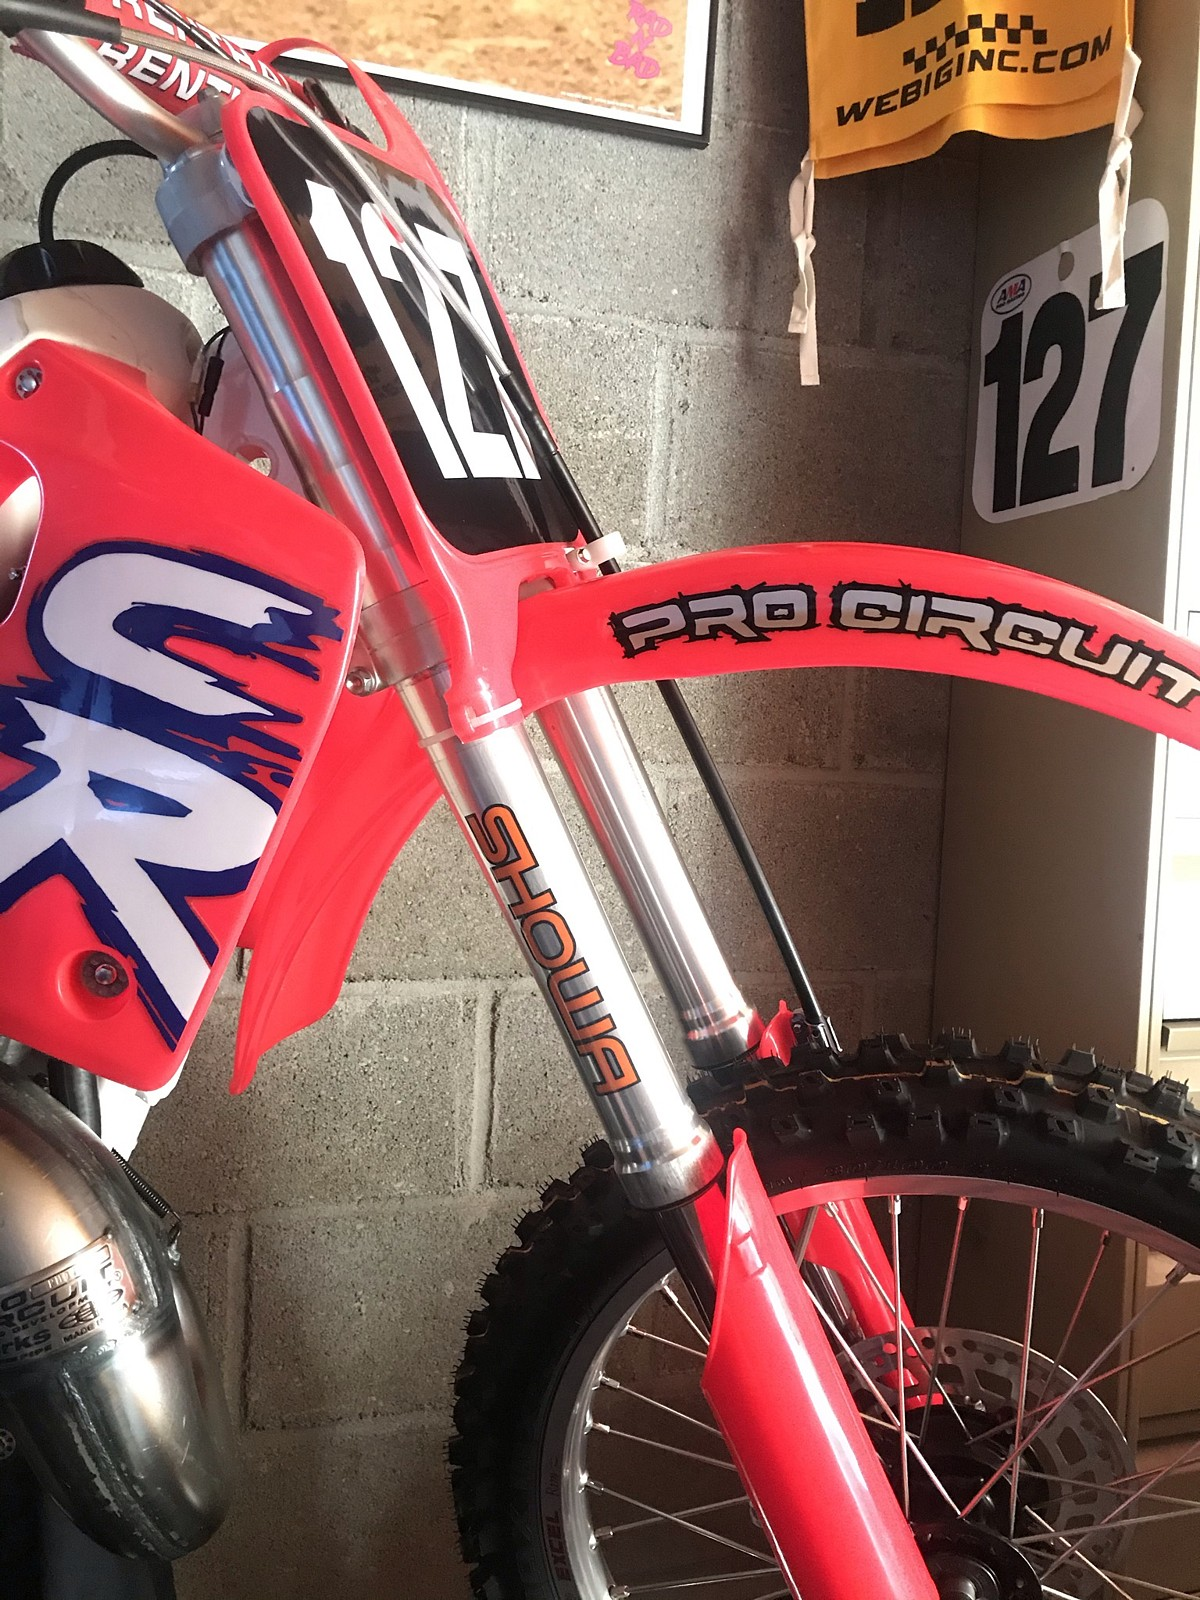 906EB20C-BDF0-4147-89FB-125A9D246284 - Godcho - Motocross Pictures - Vital MX